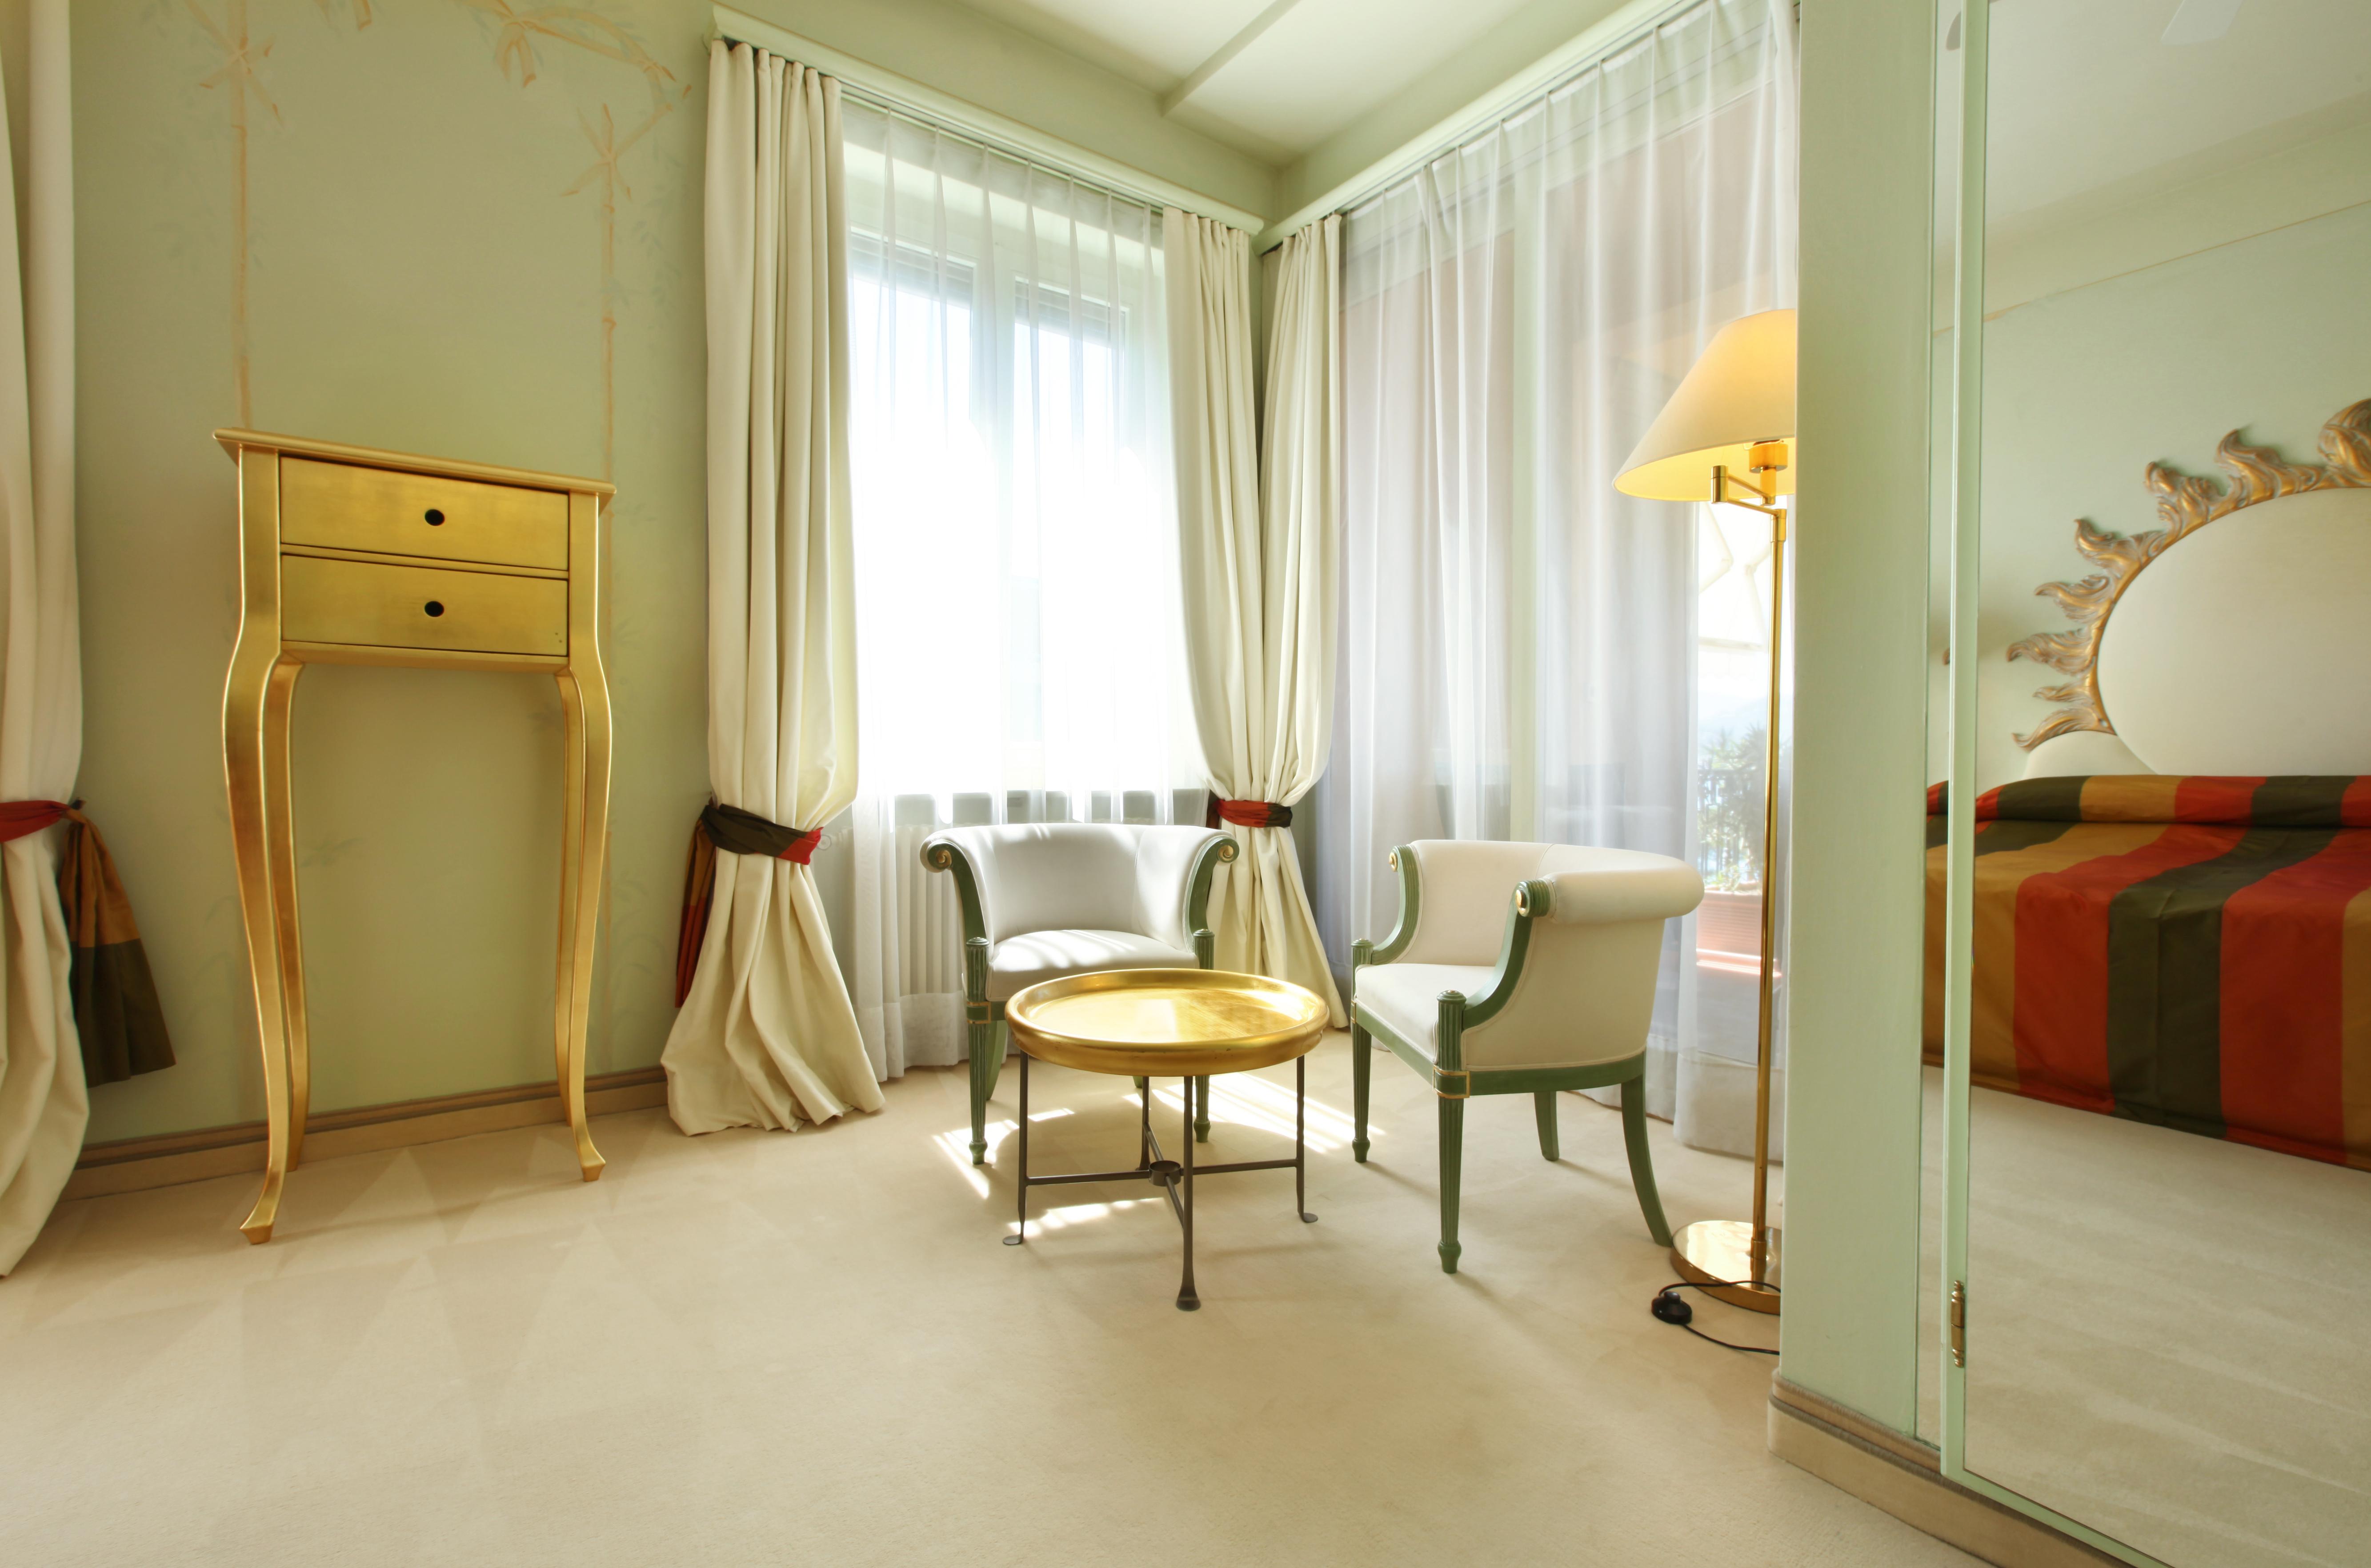 prestige decor gardinen nach ma vorh nge in berlin. Black Bedroom Furniture Sets. Home Design Ideas